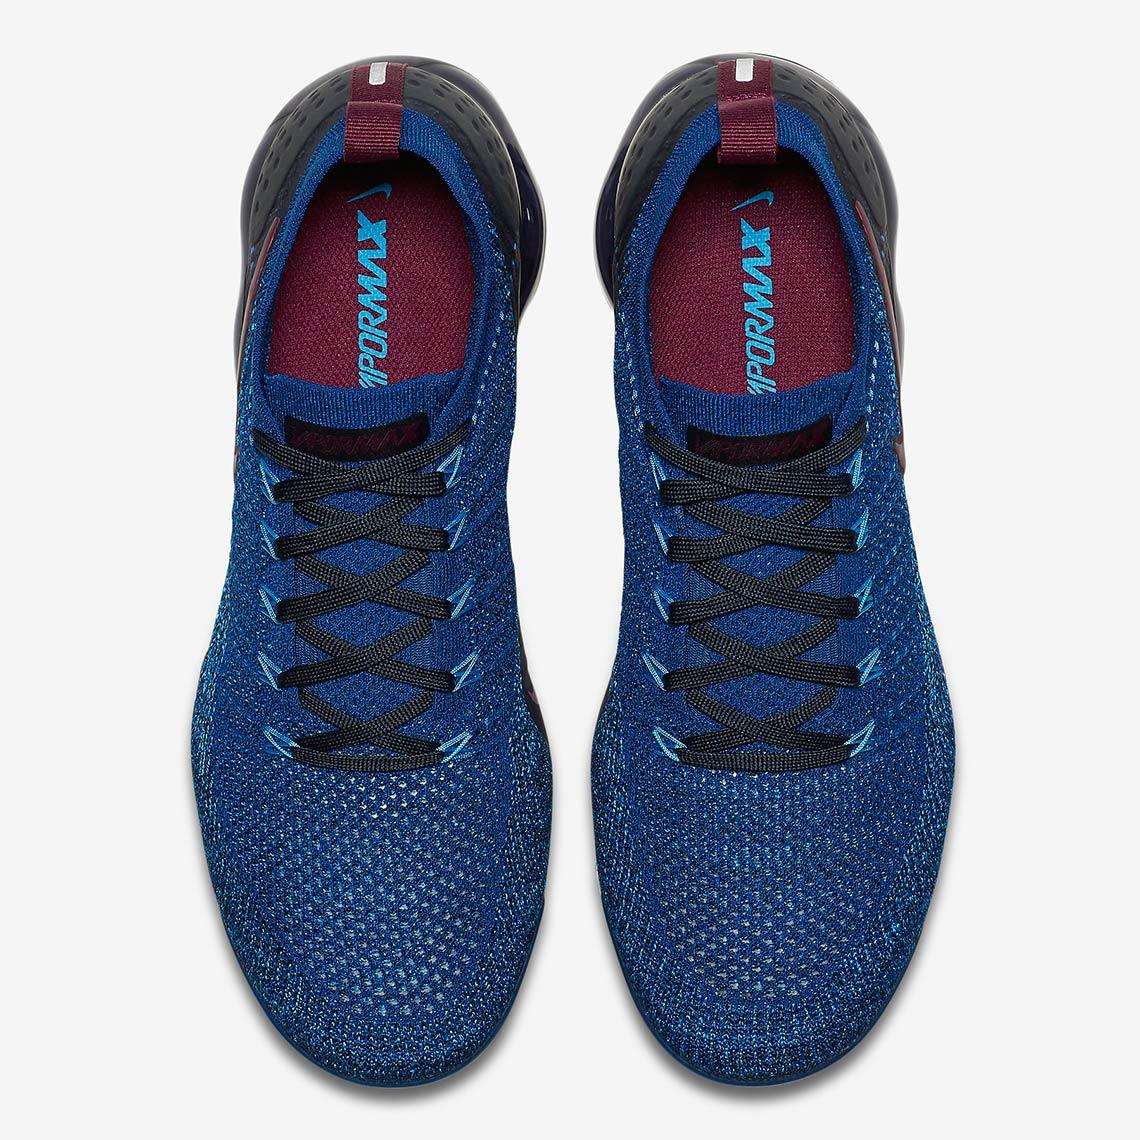 Nike Vapormax 2.0 Gym Blue 942842-401